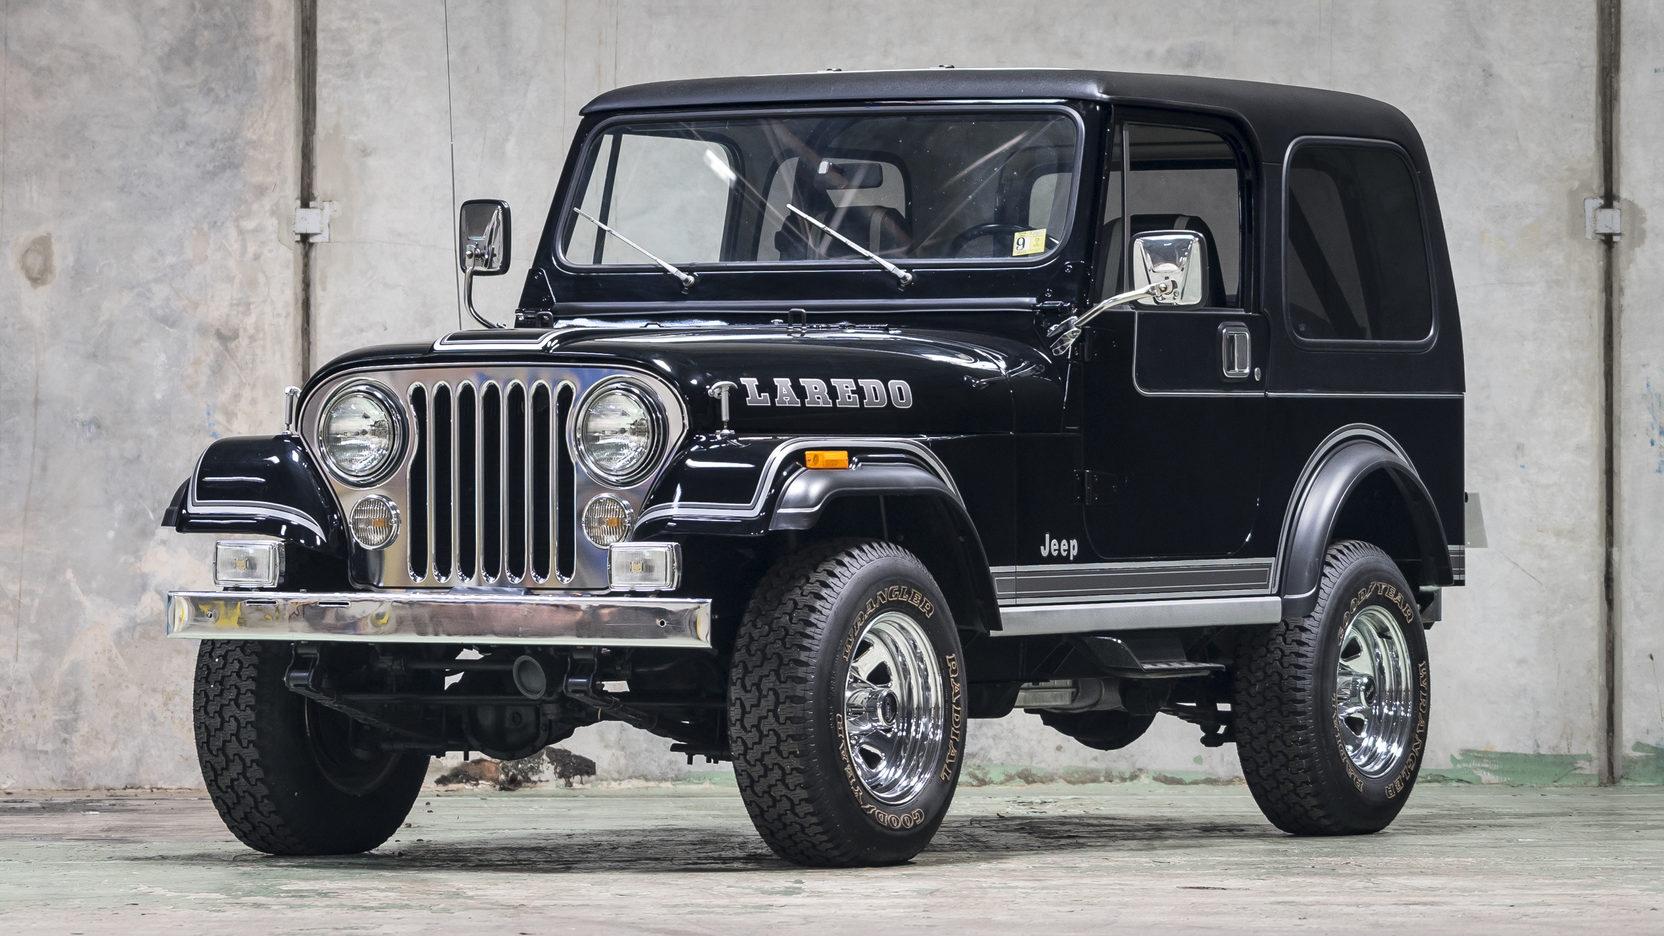 1981 Jeep CJ-7 front 3/4 driver